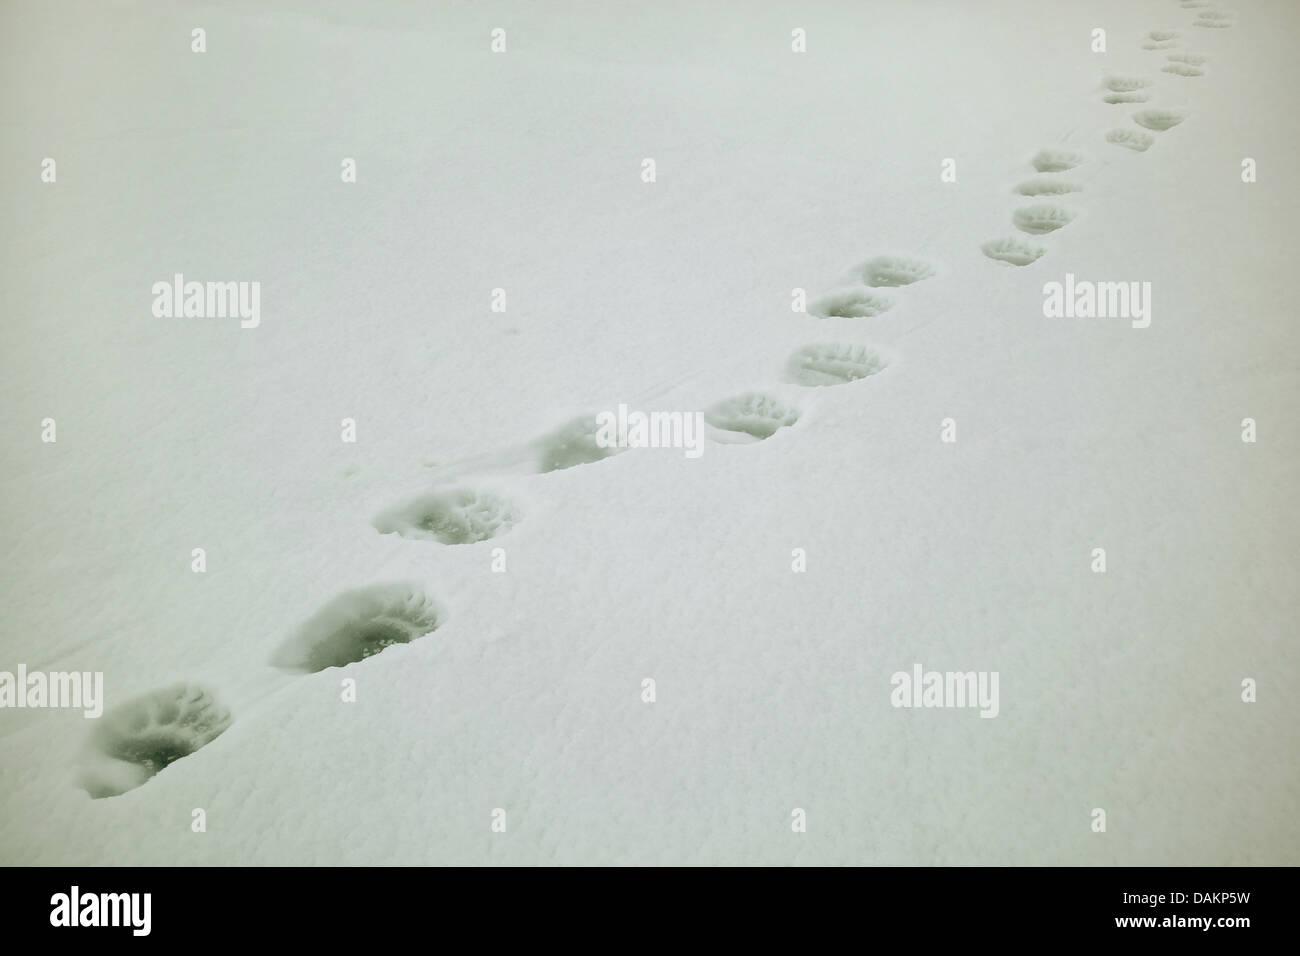 polar bear (Ursus maritimus), polar bear tracks in snow, Canada, Nunavut, Sirmilik National Park - Stock Image